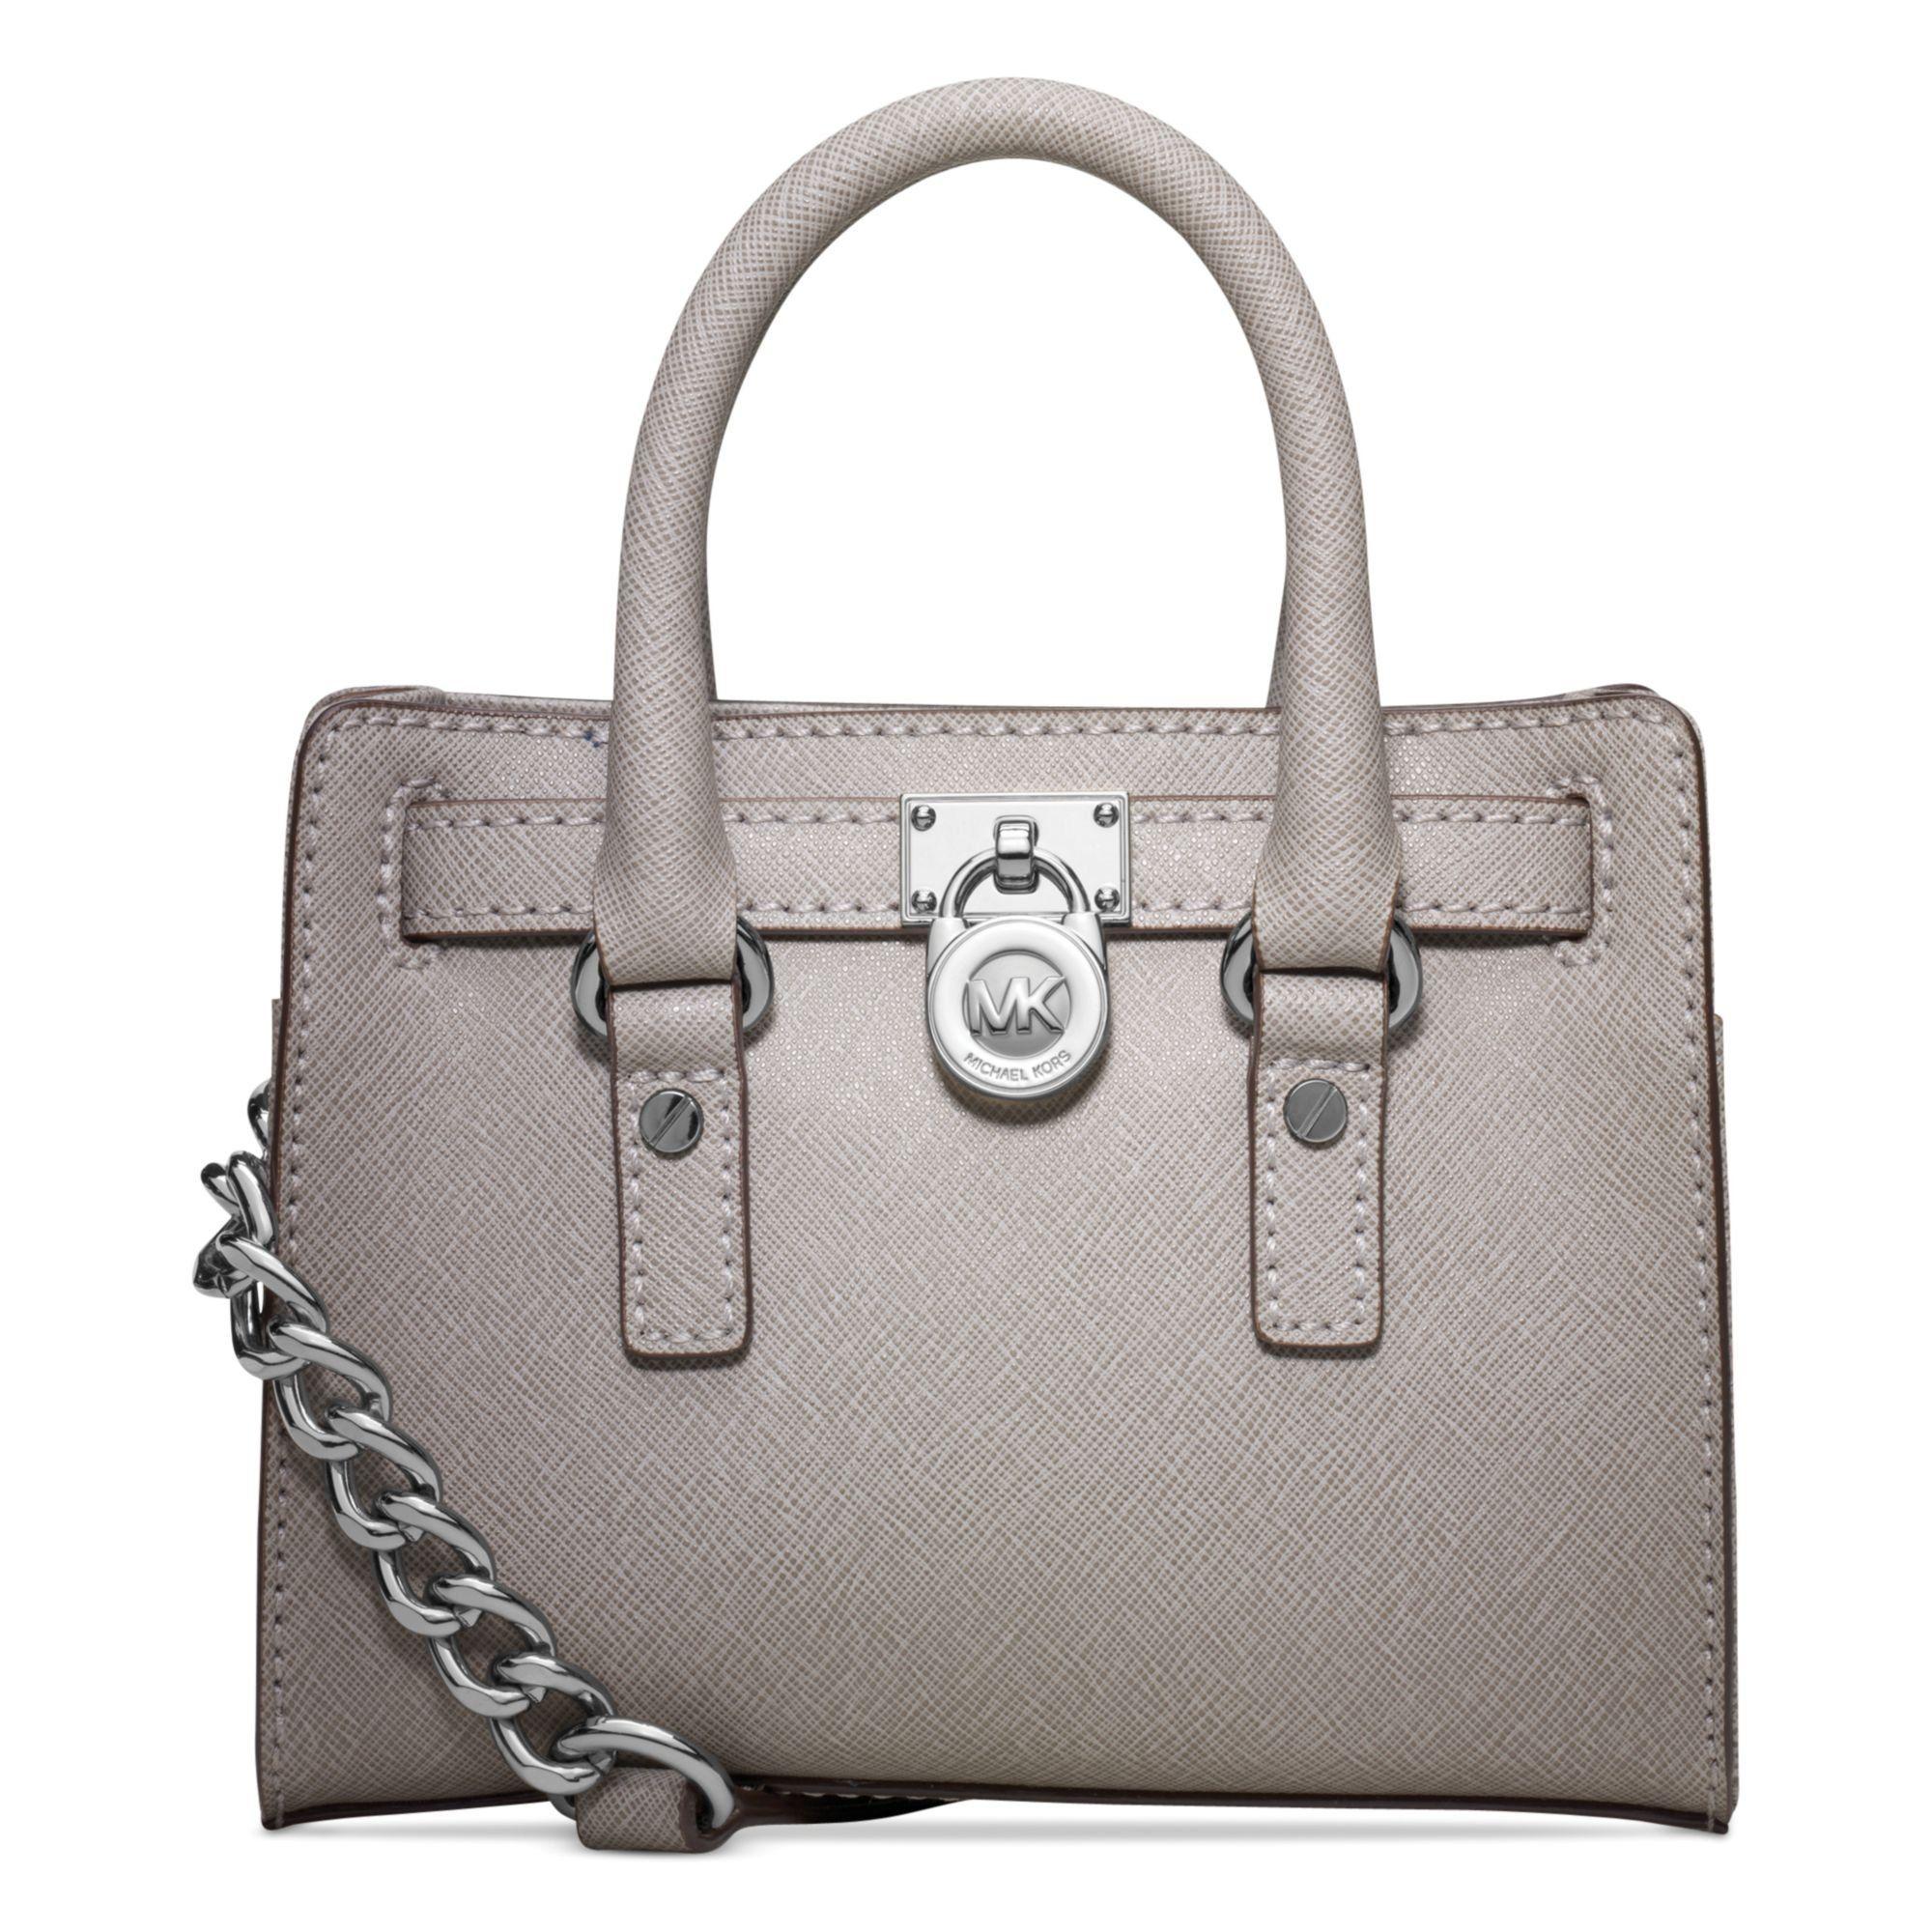 Michael Kors Mini Hamilton Satchel Pearl Grey: Handbags: Amazon.com